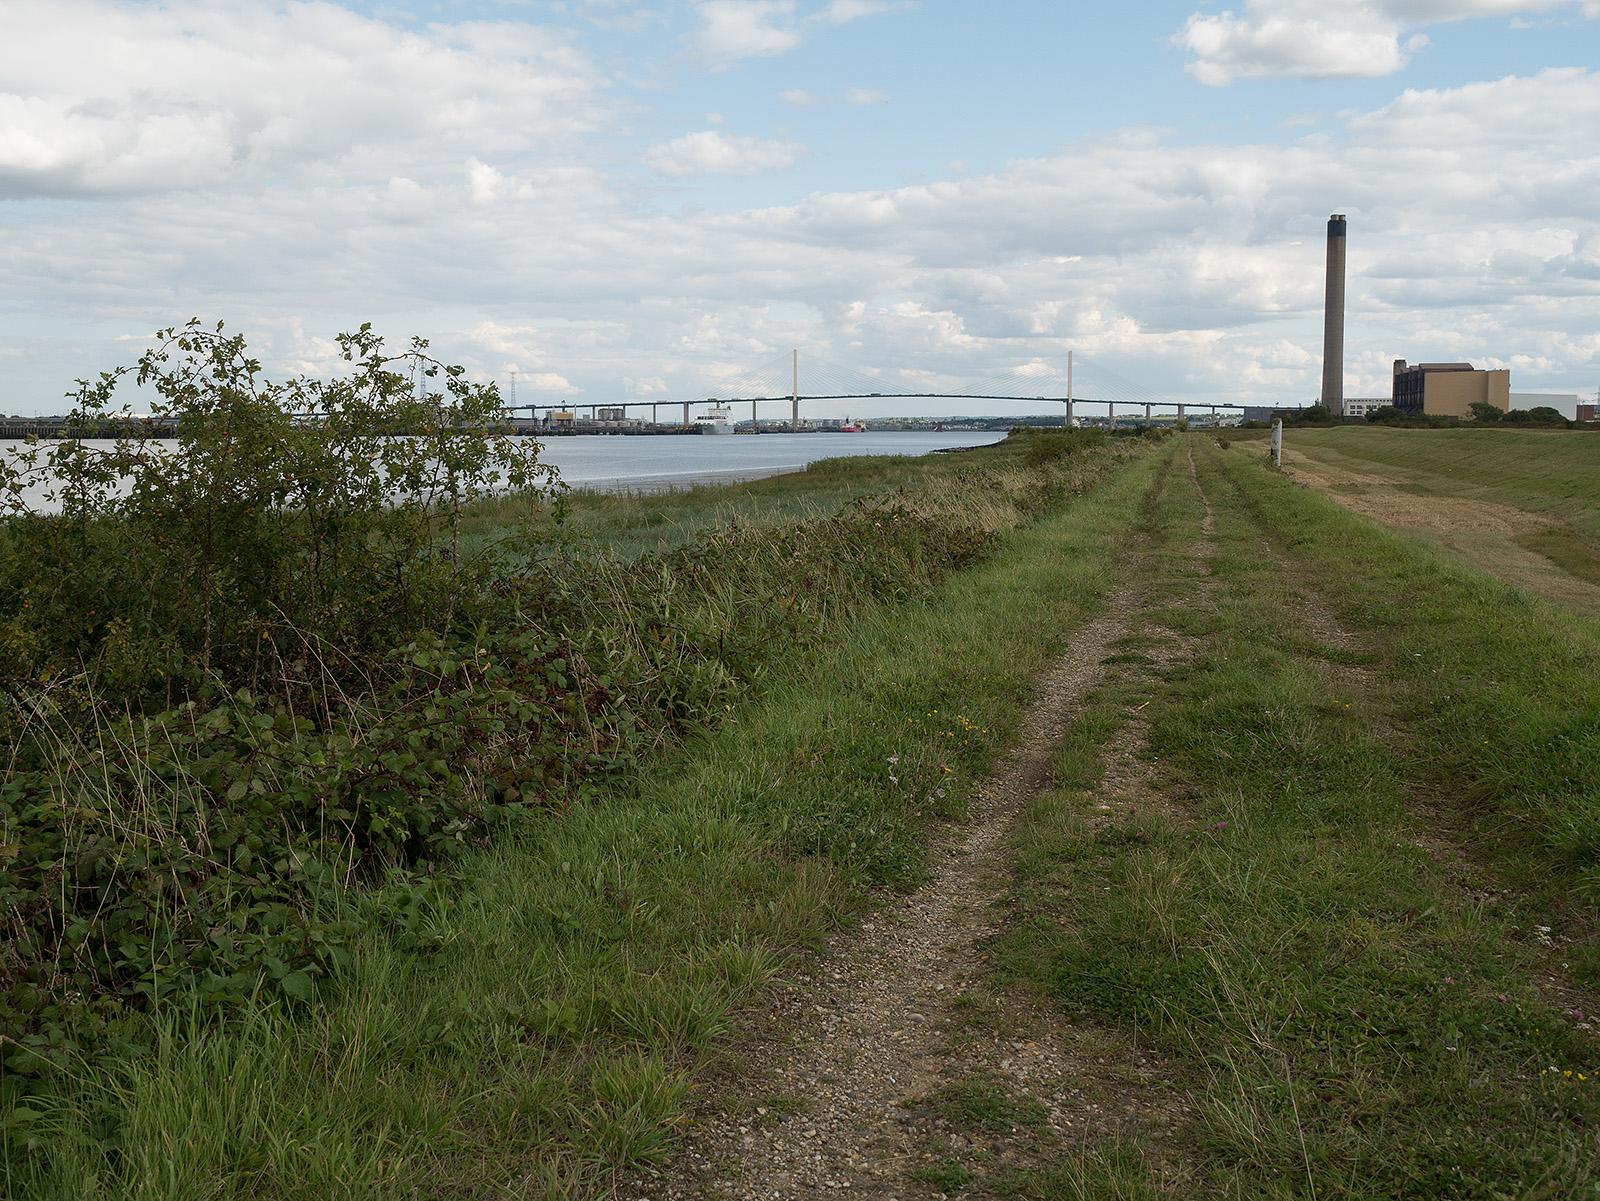 Heading eastwards, the QE2 bridge dominates the view